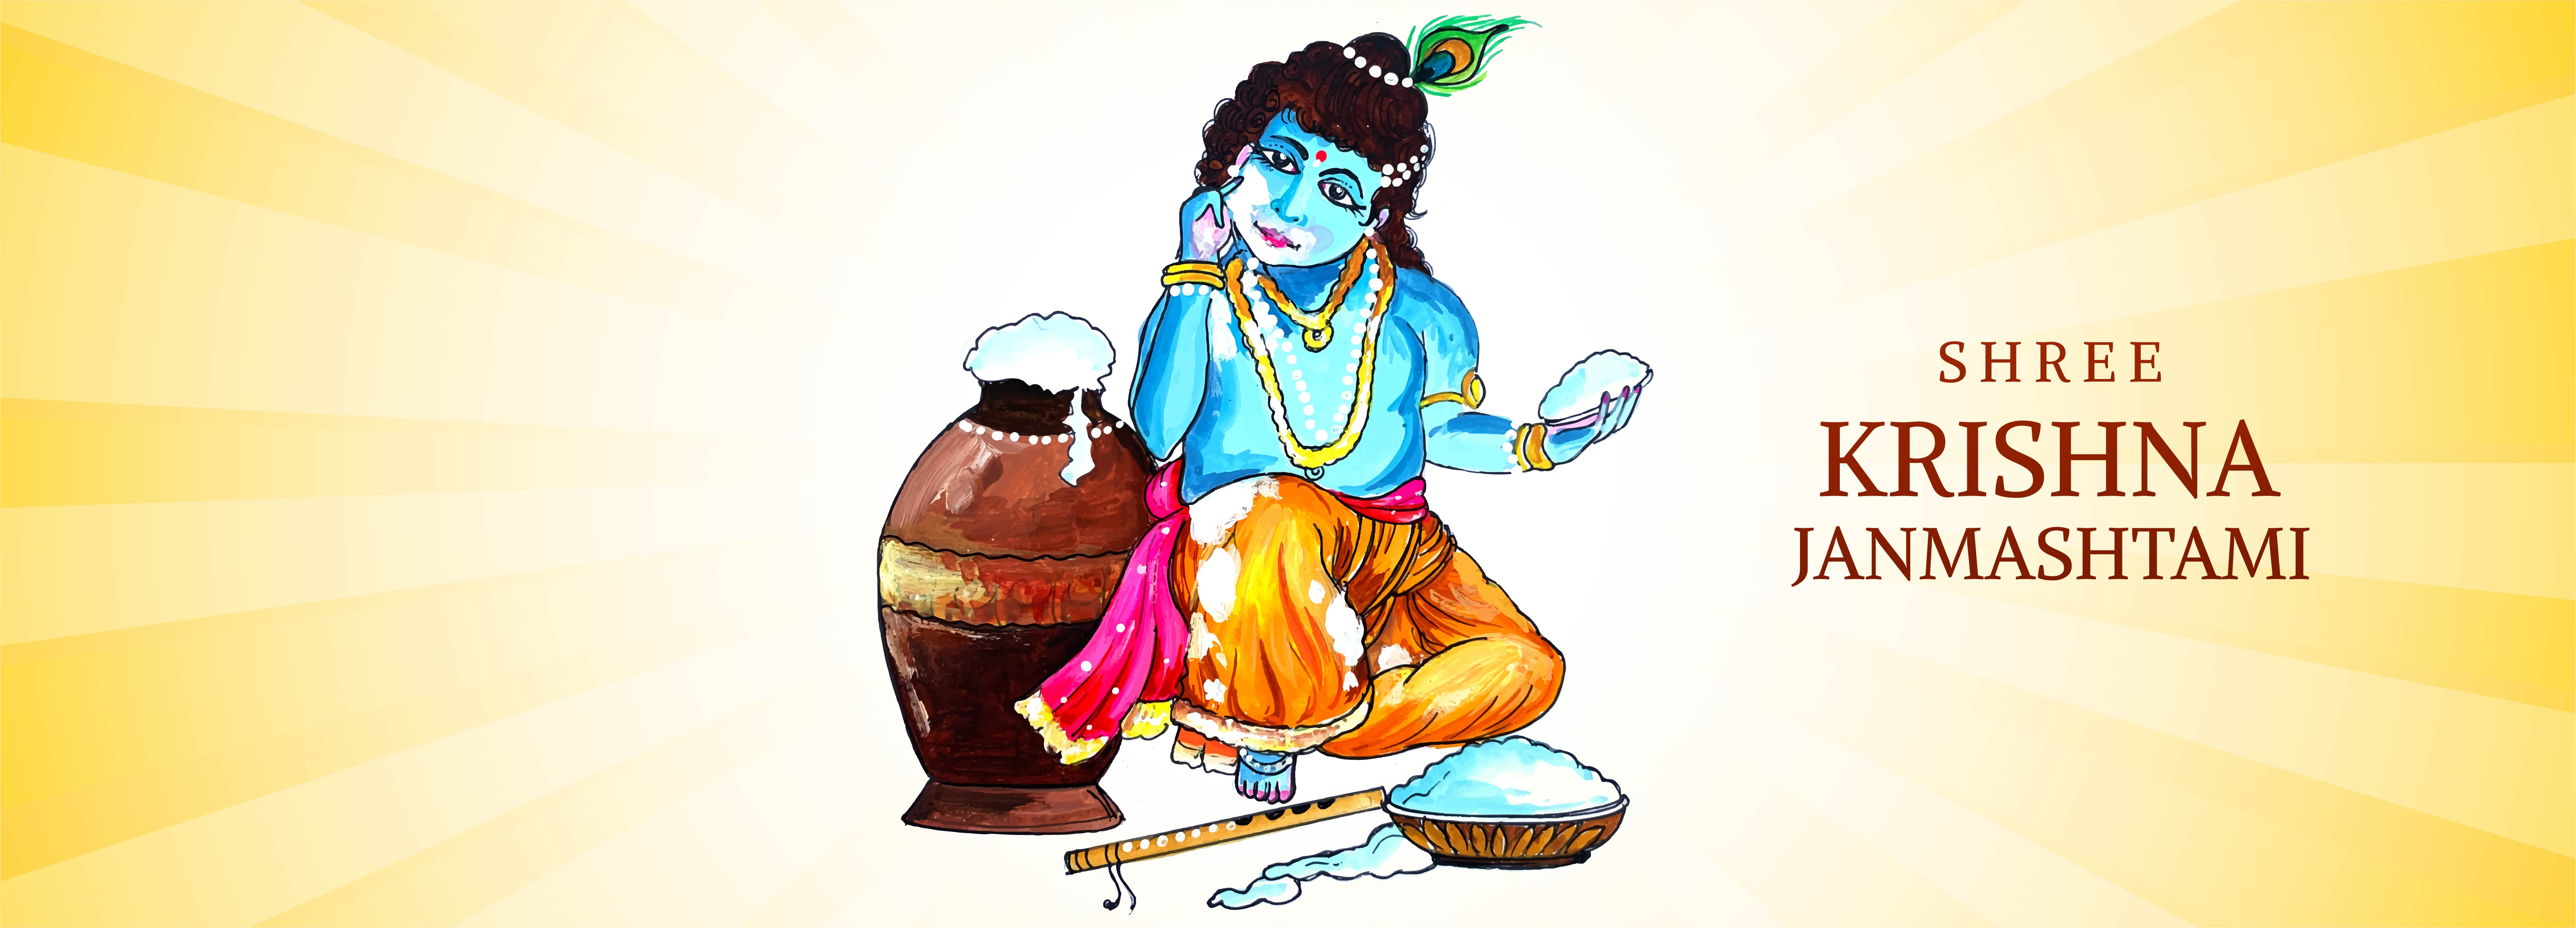 señor krishna sosteniendo un puñado de pancarta janmashtami de papilla